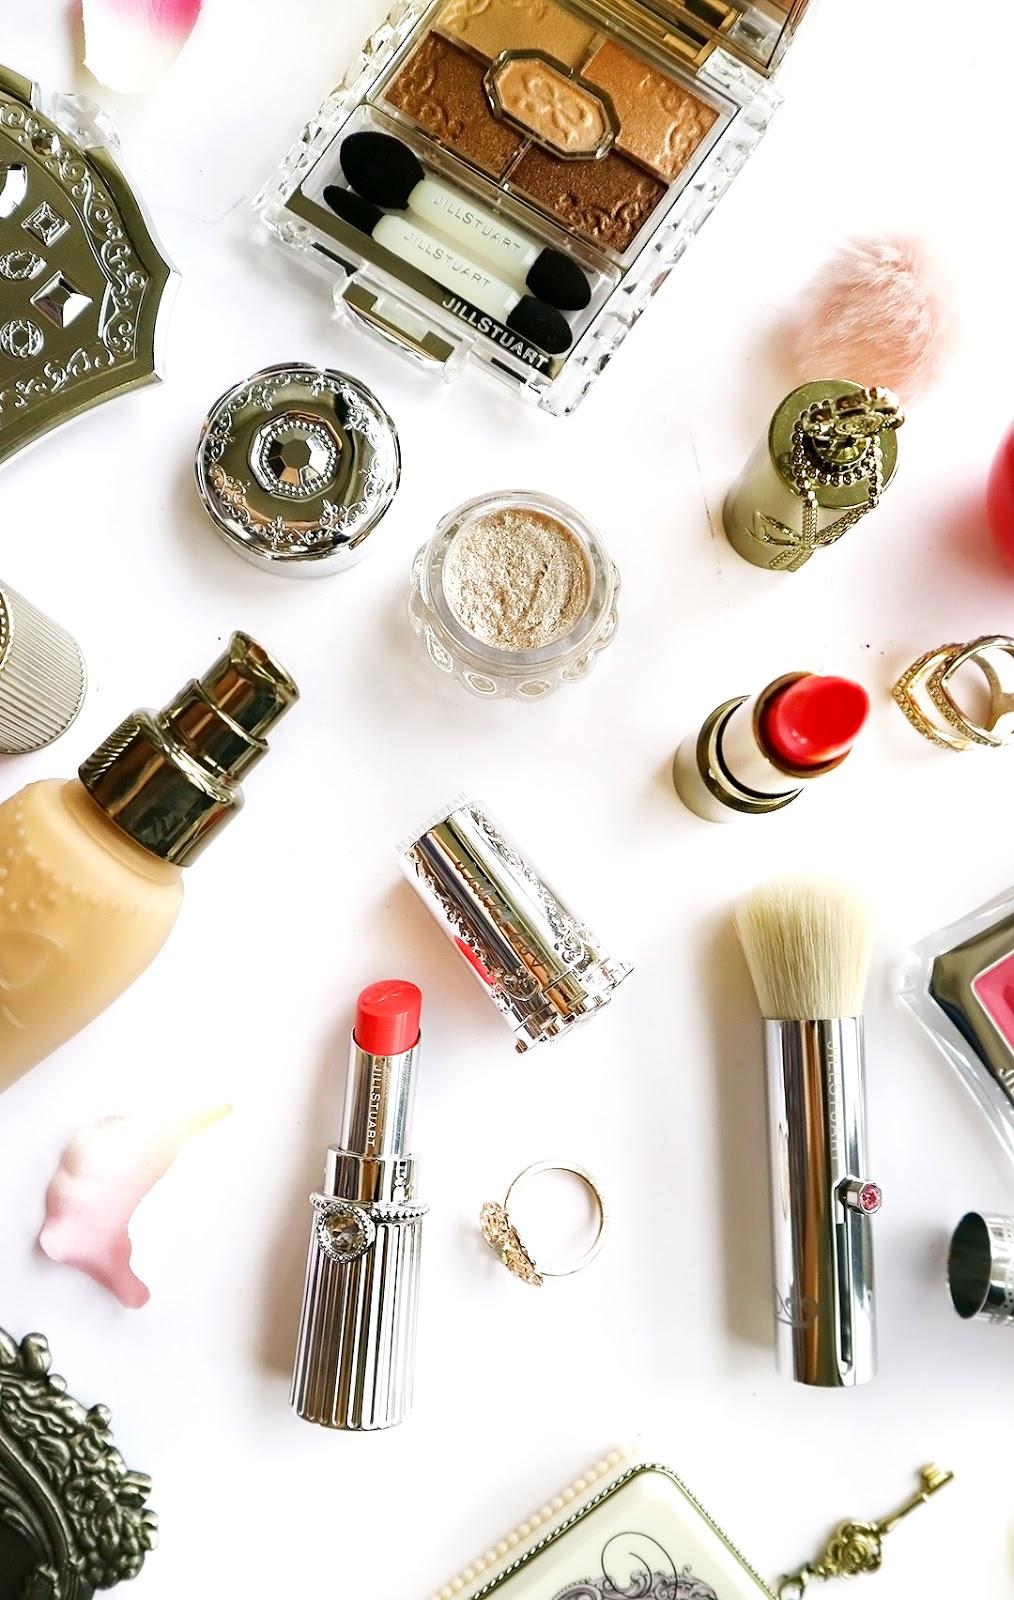 Jill Stuart Beauty Singapore and Eleanor Review